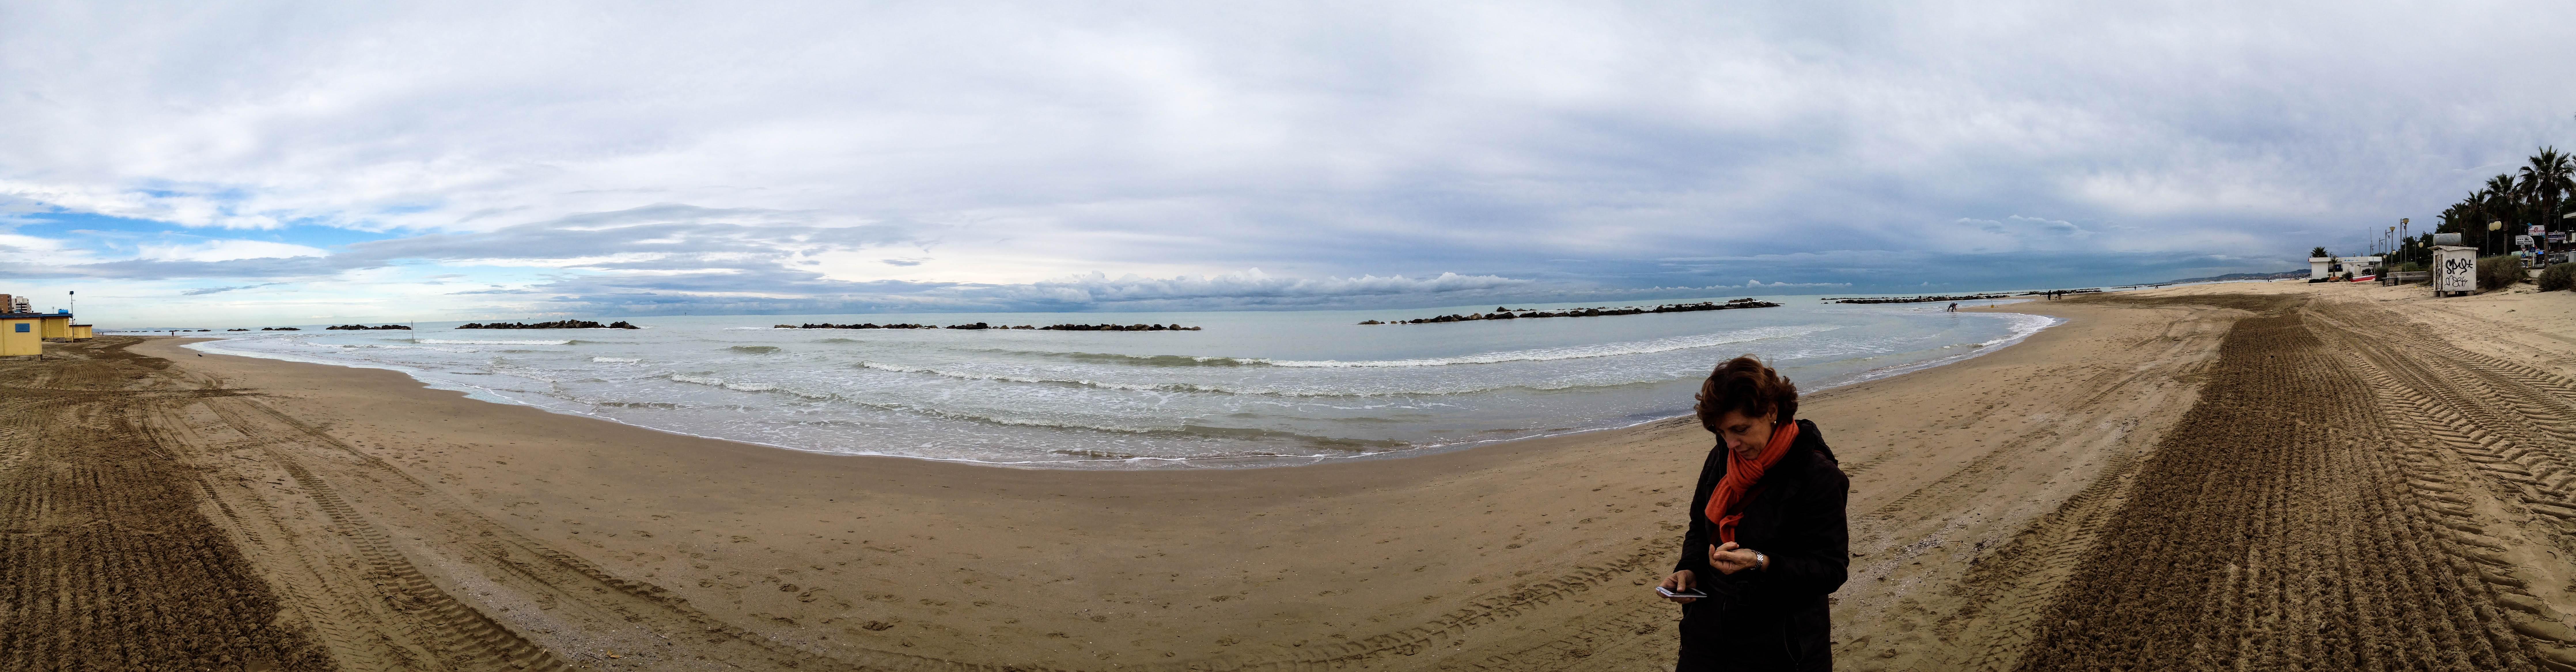 Pescara Strand gratis afbeeldingen strand zee kust zand winter duin klif